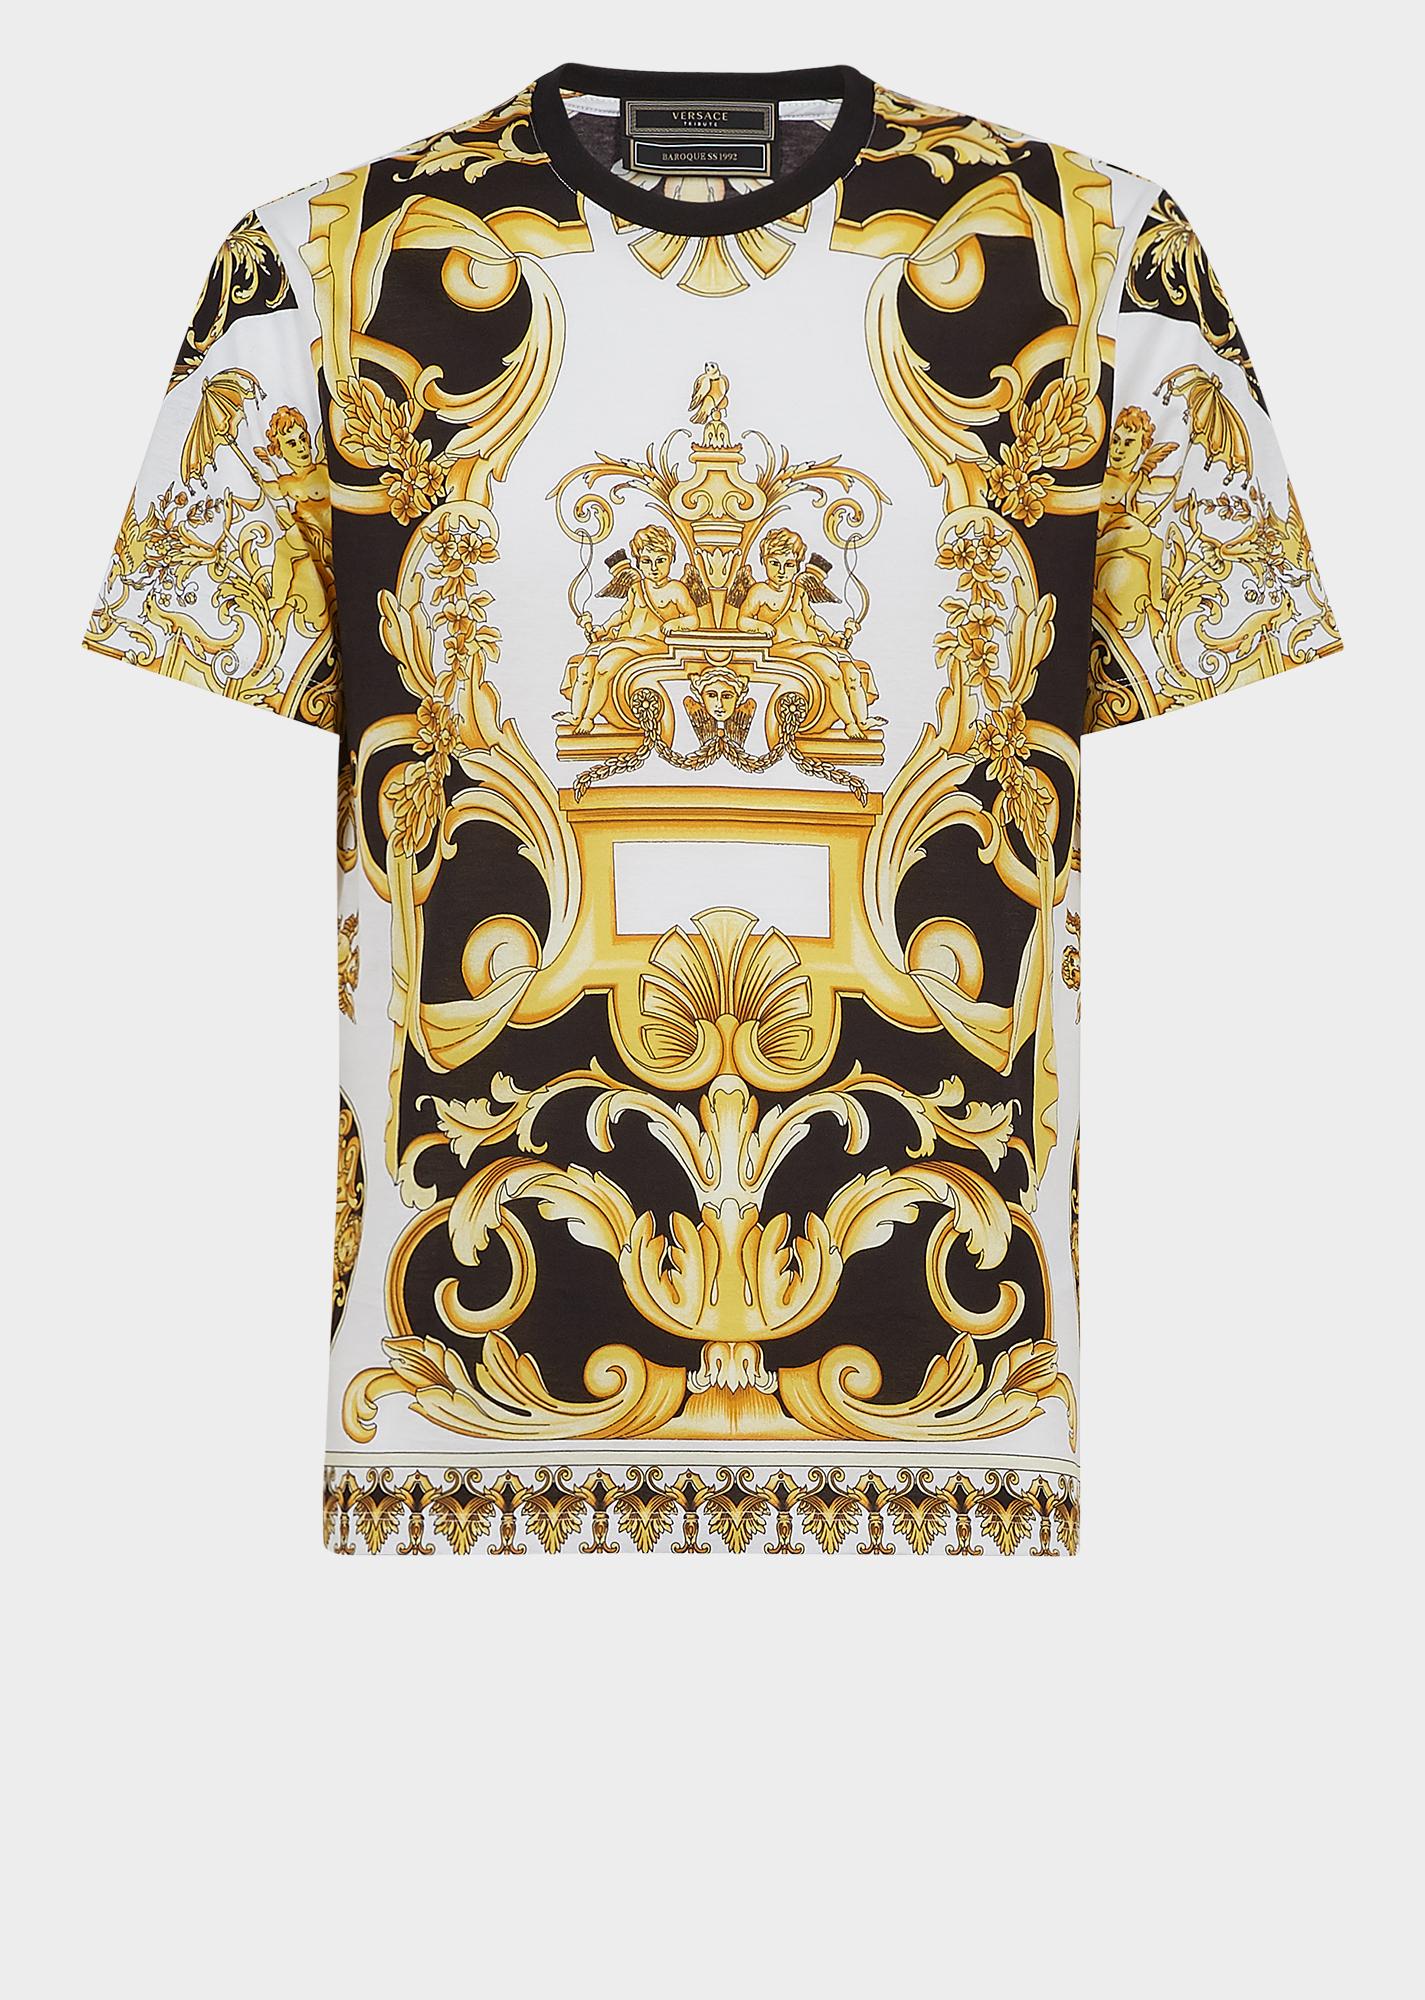 634360d01716b1 T-Shirt mit Barocco SS 92-Print - Gemustert T-shirts